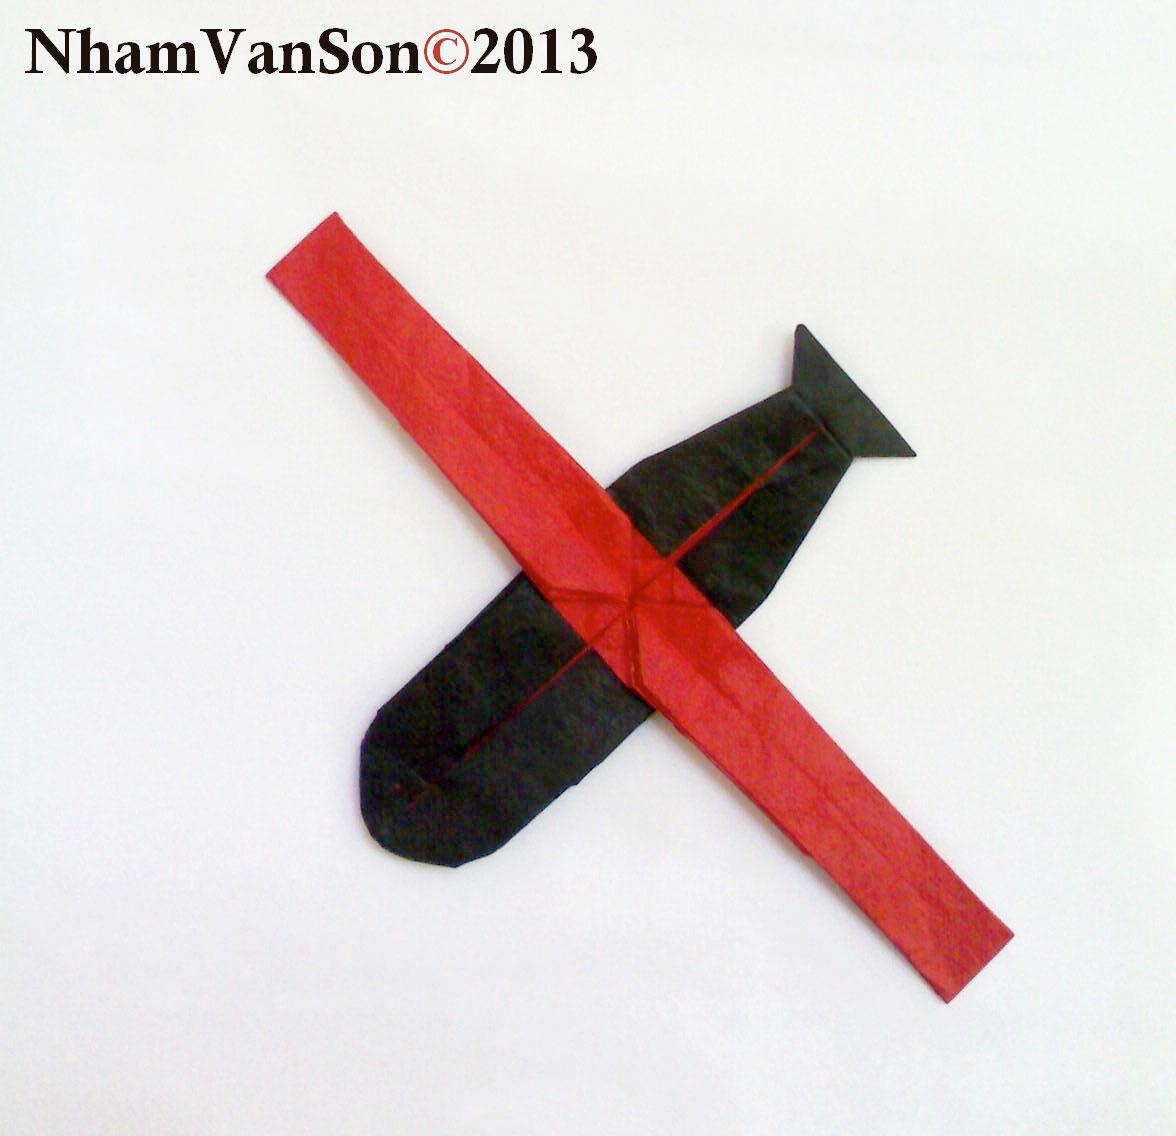 Nham van Son